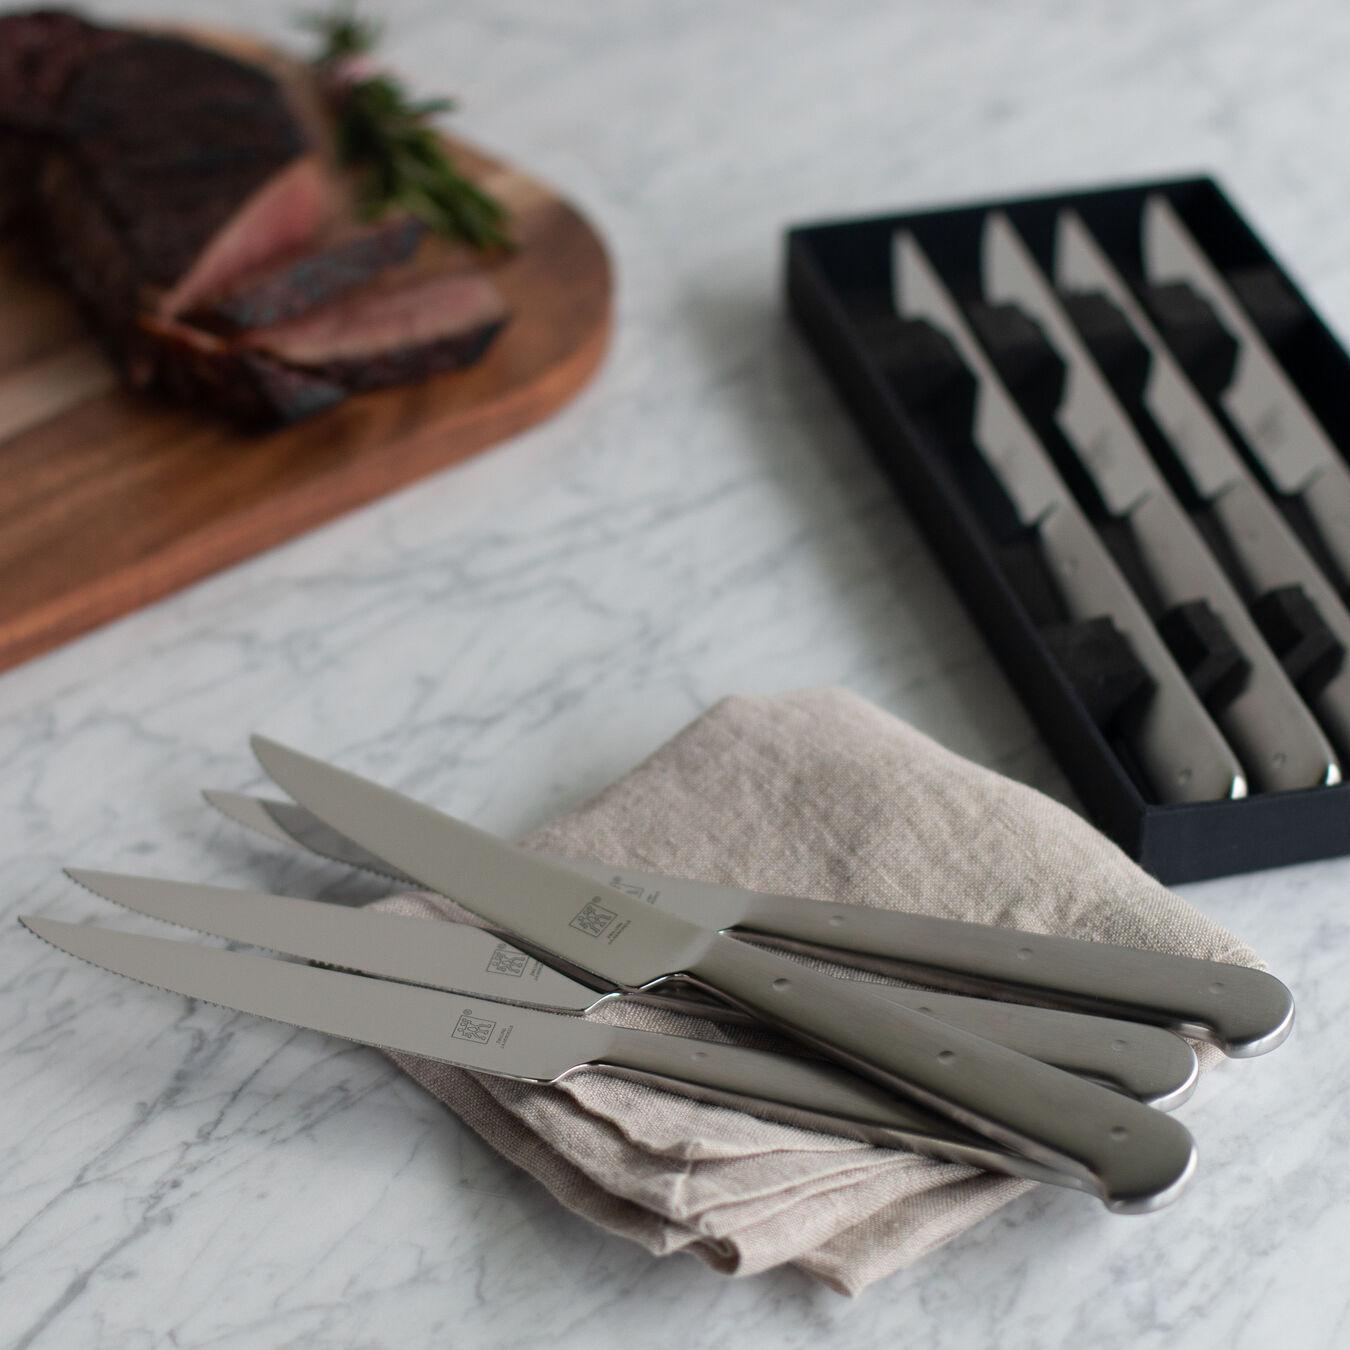 8-pc, stainless steel Porterhouse Steak Knife Set in Black Presentation Box,,large 7